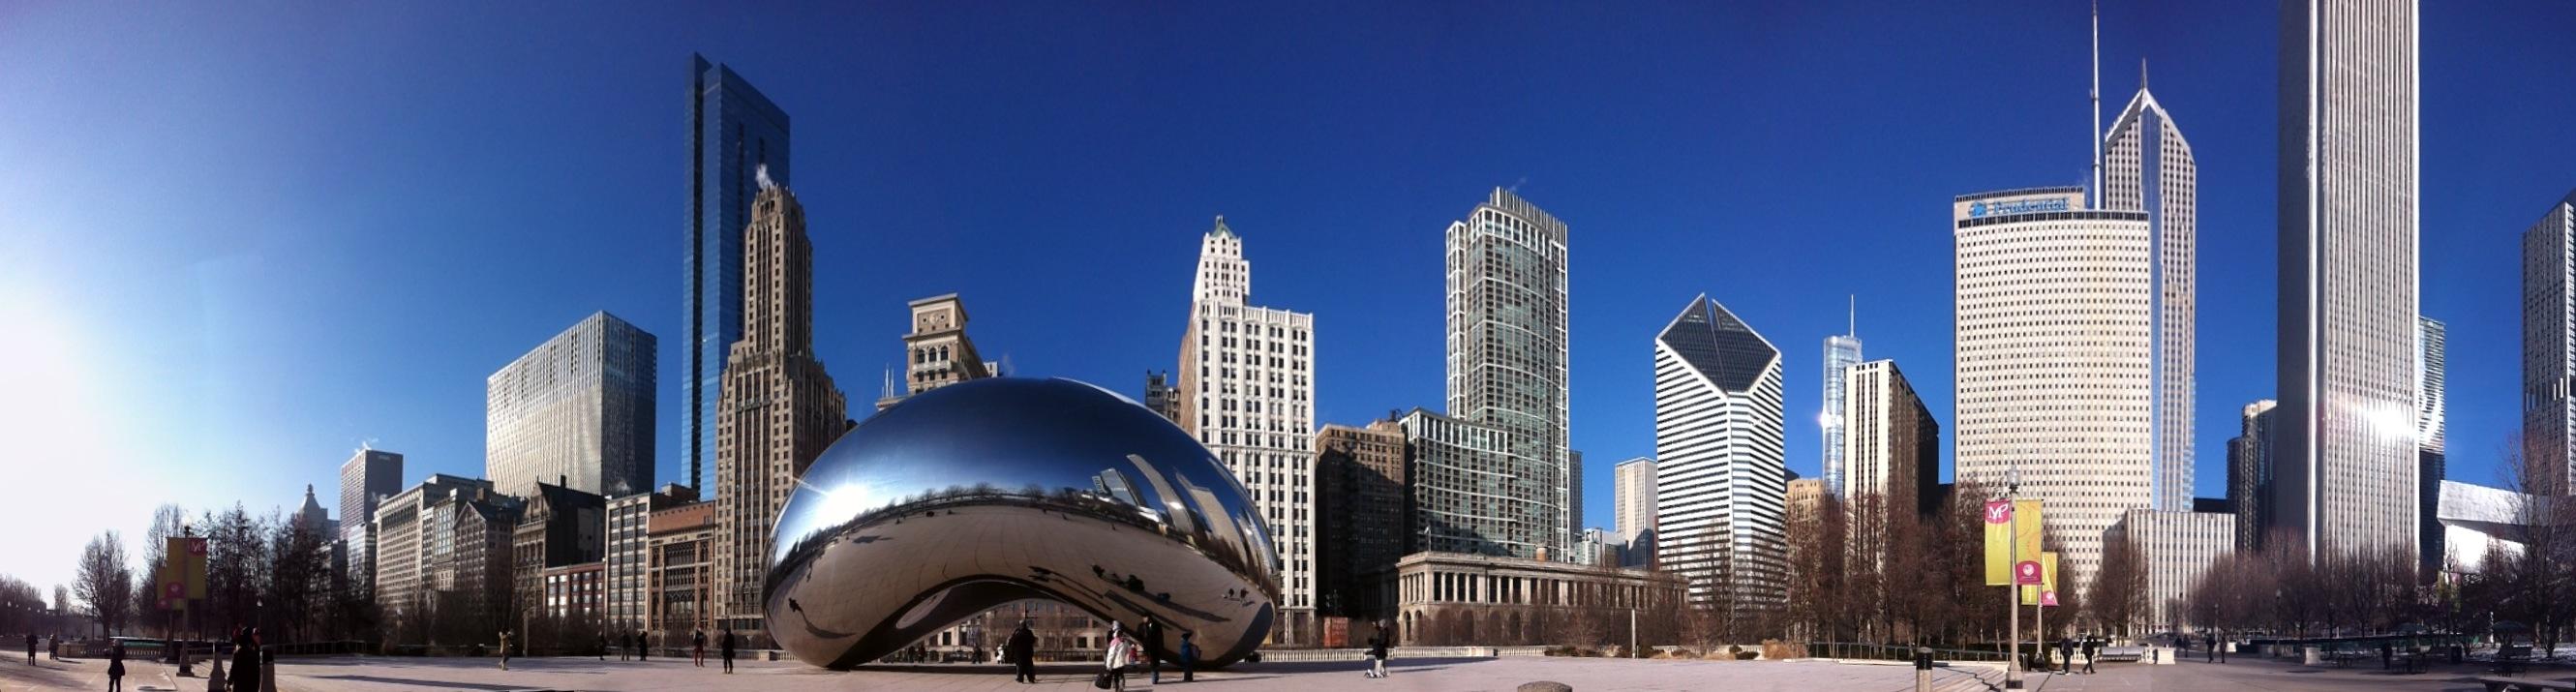 Chicago_Cloud_Gate.jpg